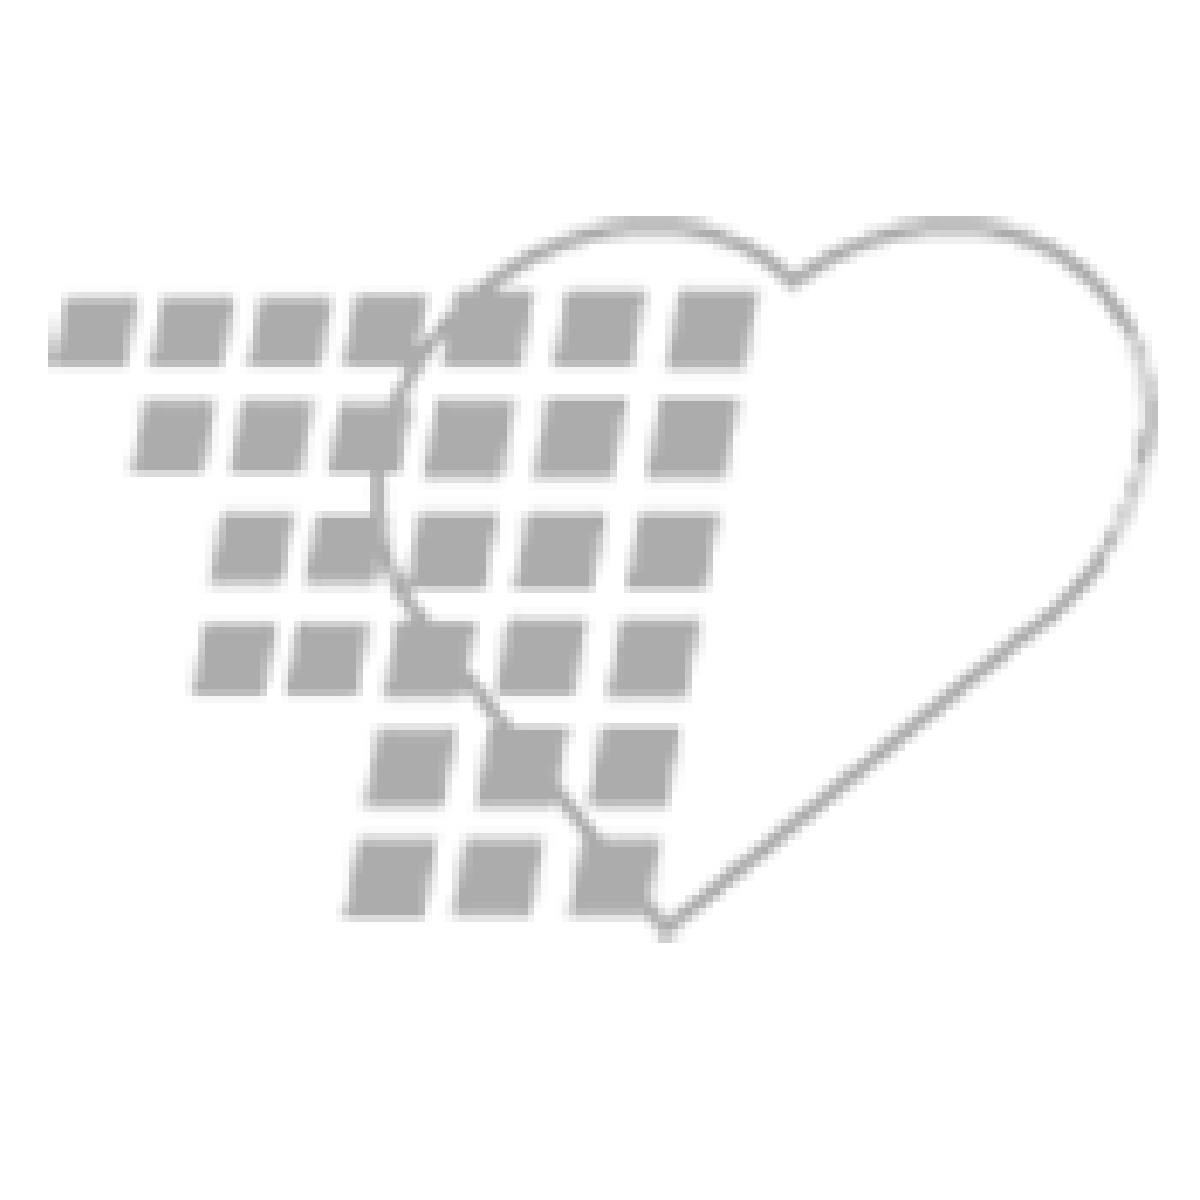 06-93-8505 - Demo Dose® Naxolon Hydrochlorid Narcn 2mg 2ml